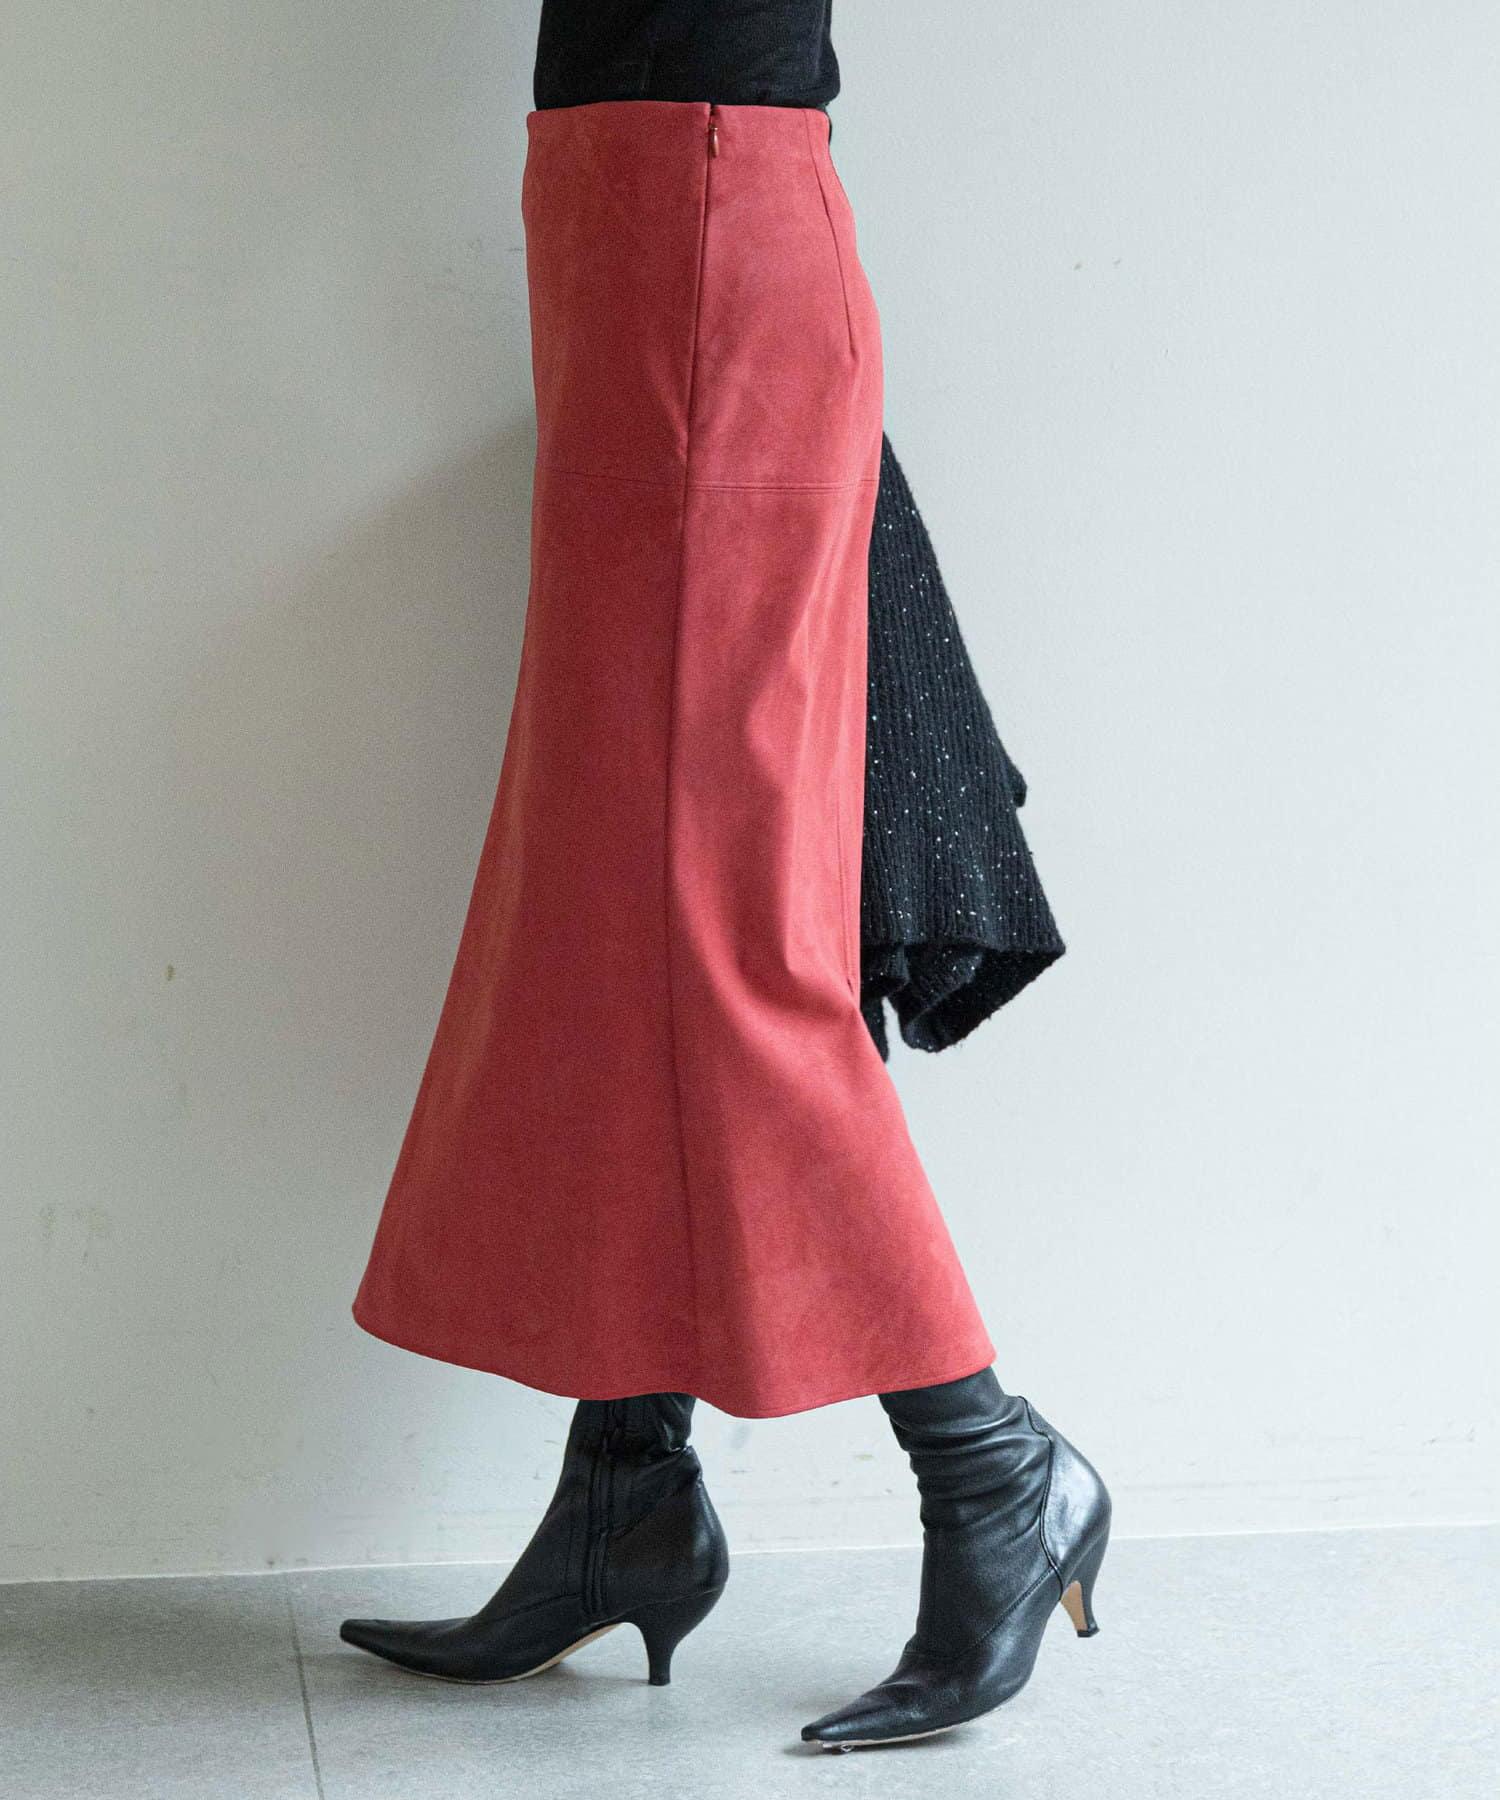 GALLARDAGALANTE(ガリャルダガランテ) エコスエードマーメイドスカート